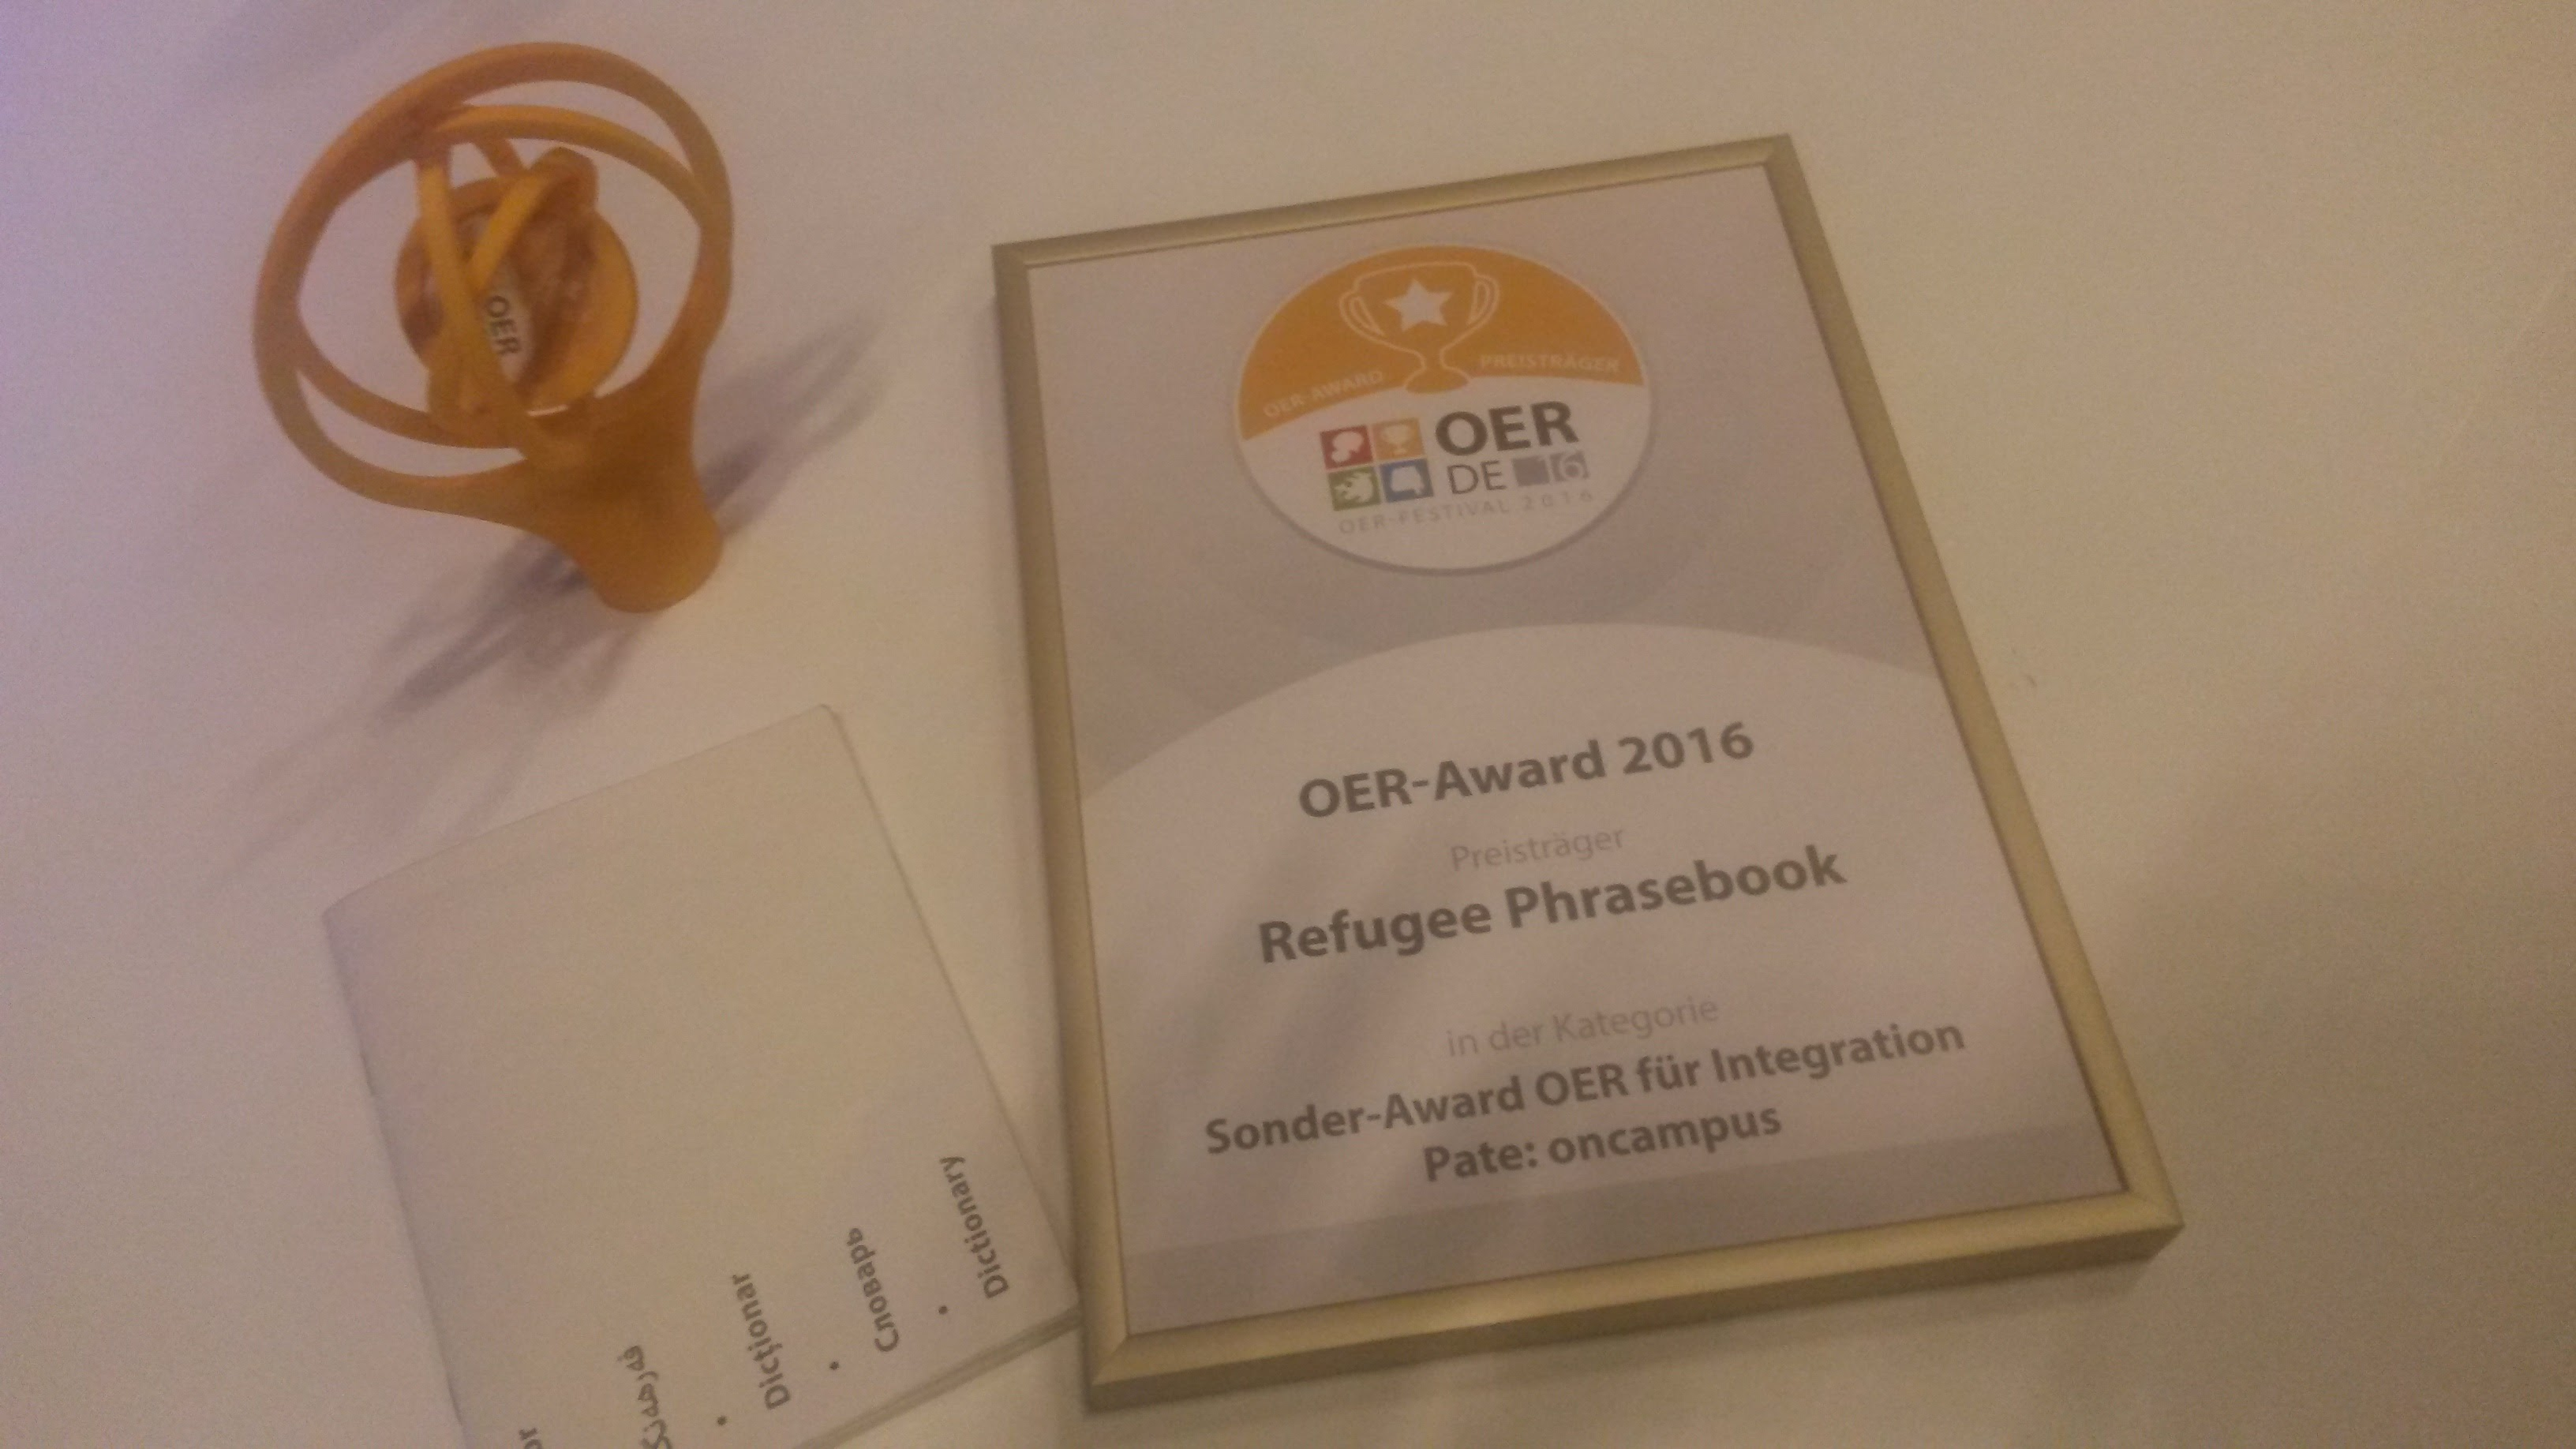 OER Award